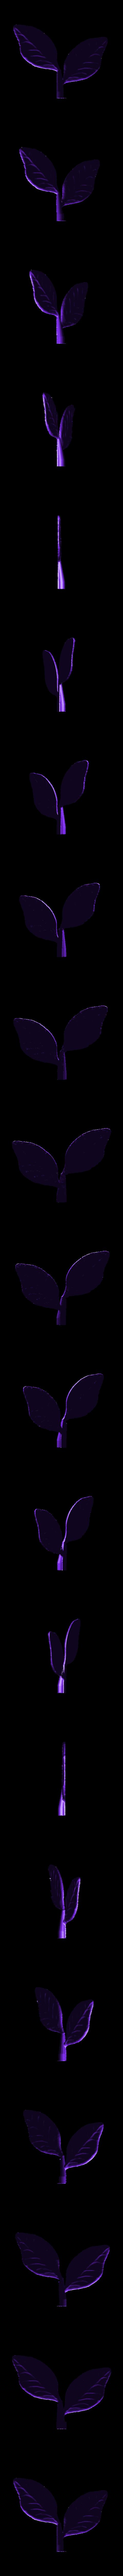 Flower Leaf.stl Download free STL file Daisy - Flat flower • 3D printable template, mag-net